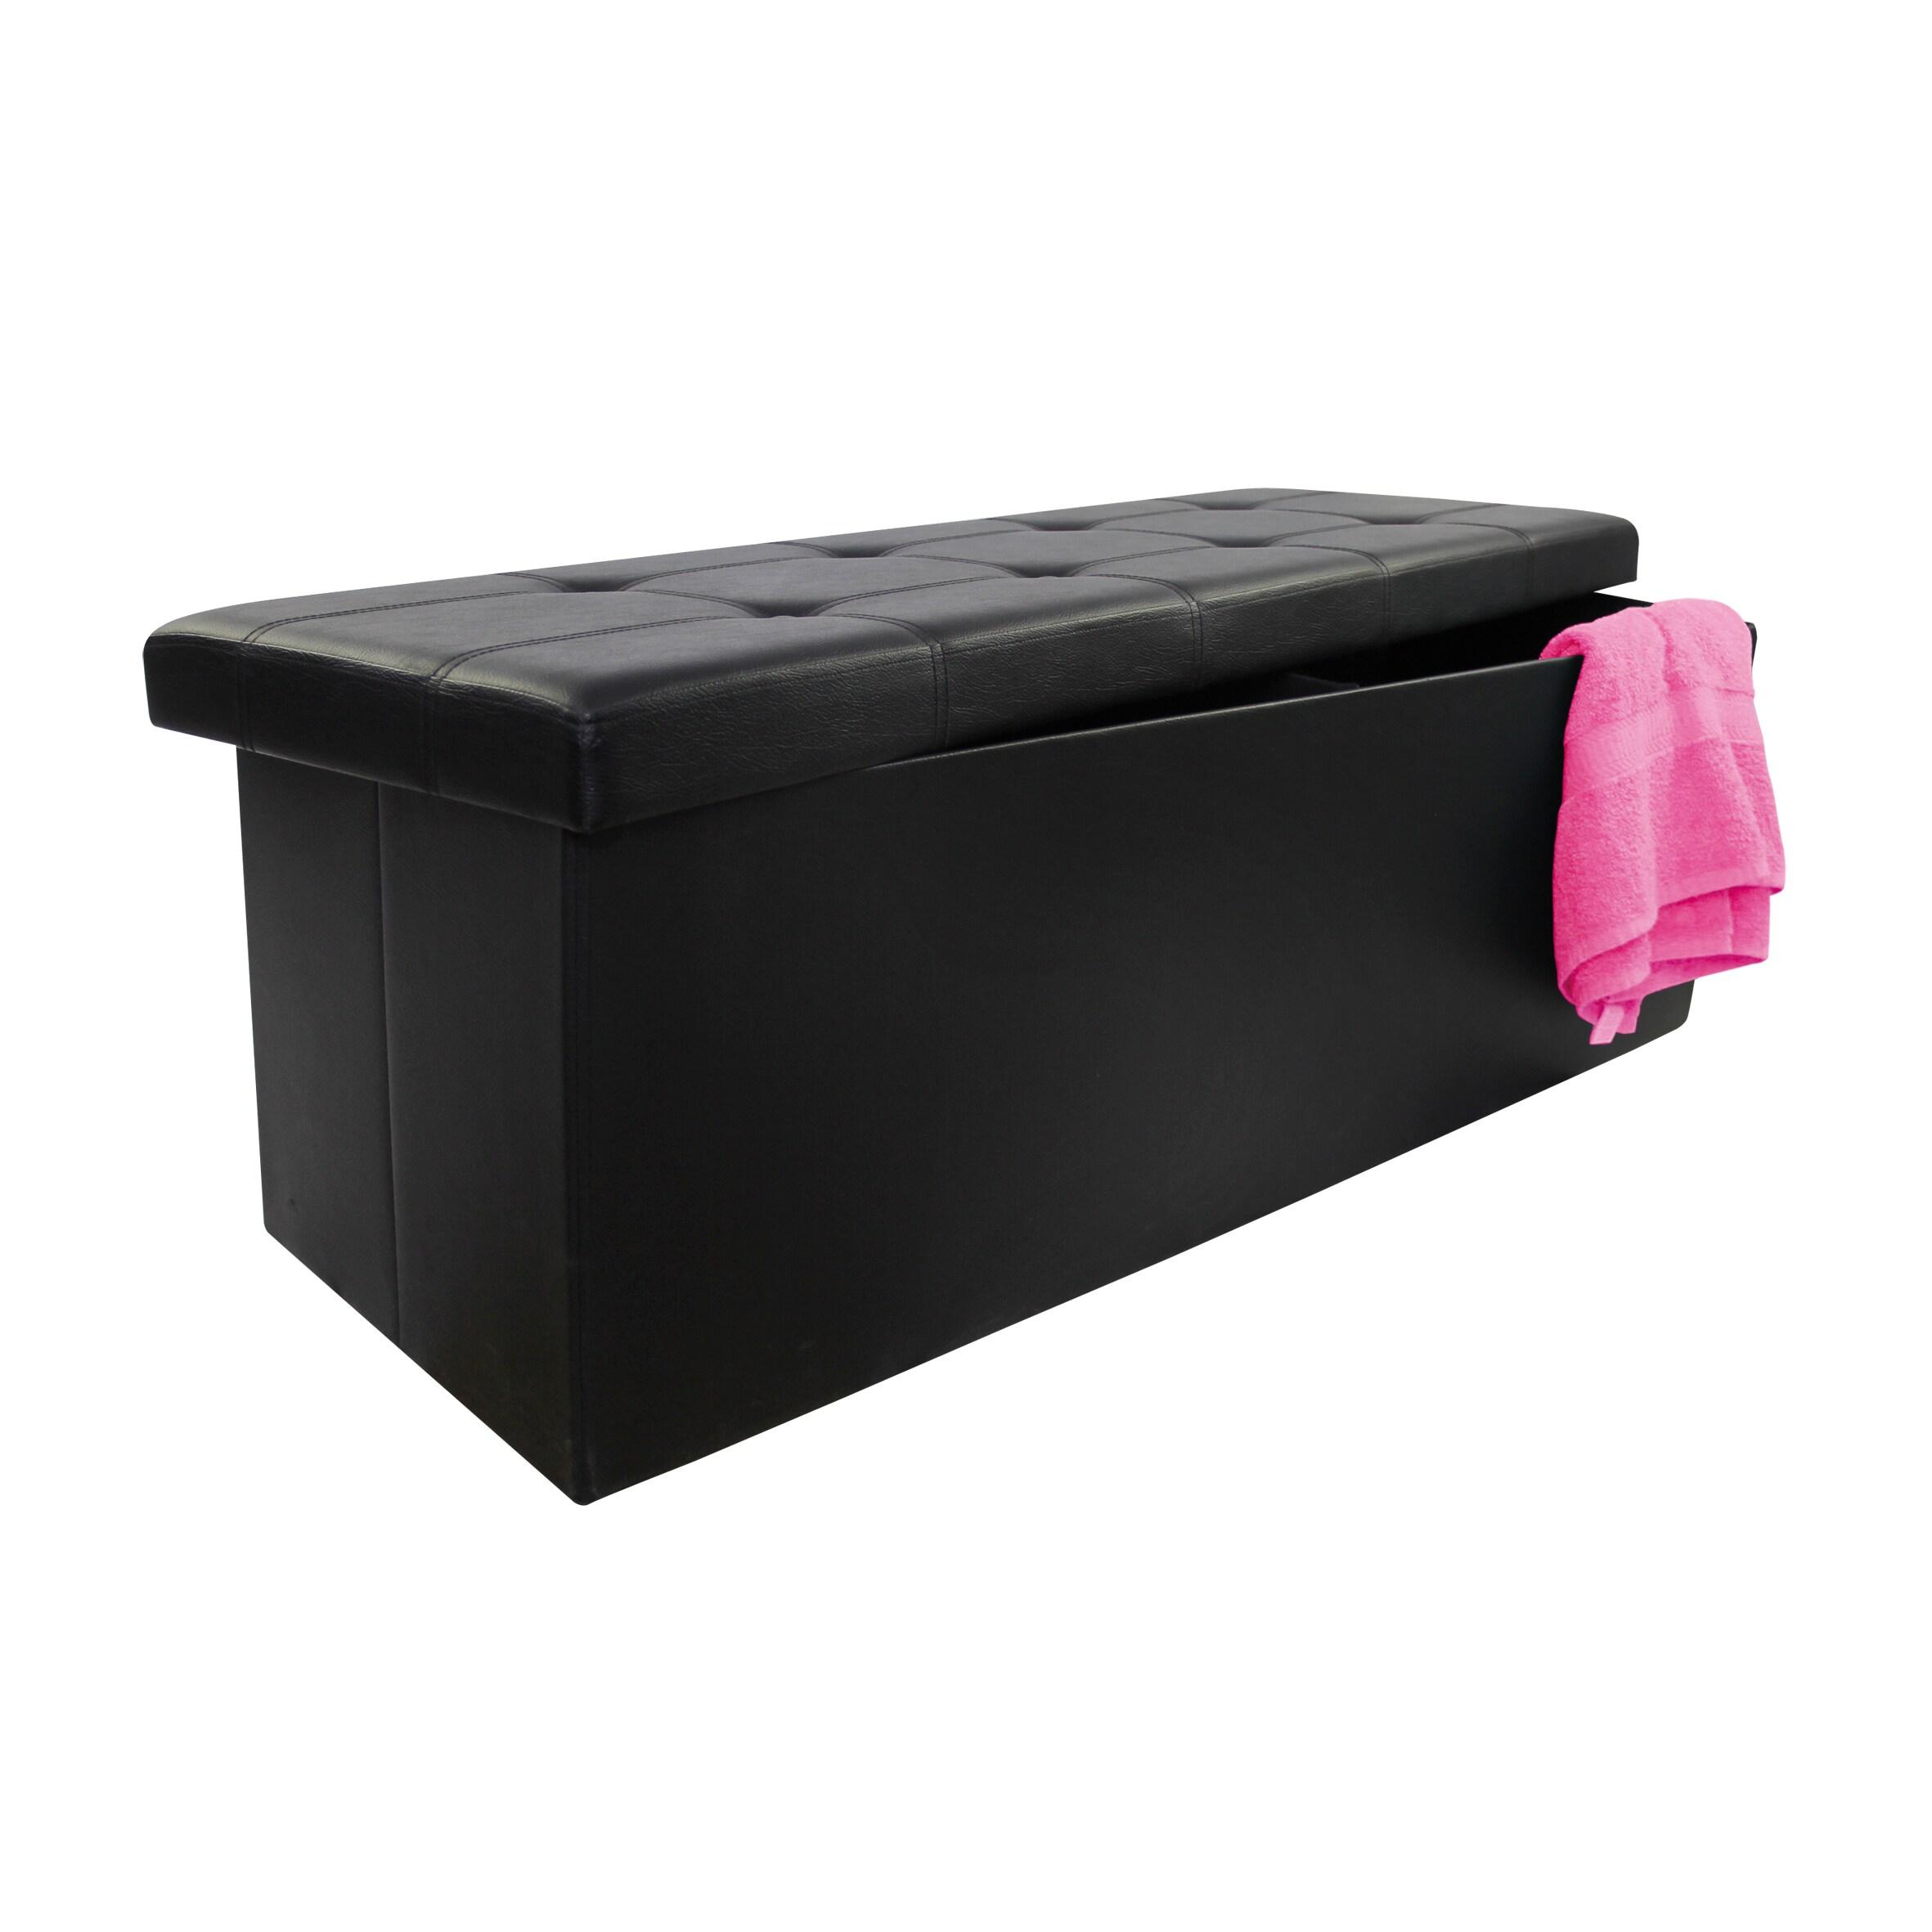 BEYOND Black Faux Leather Collapsible Storage Ottoman (Bl...